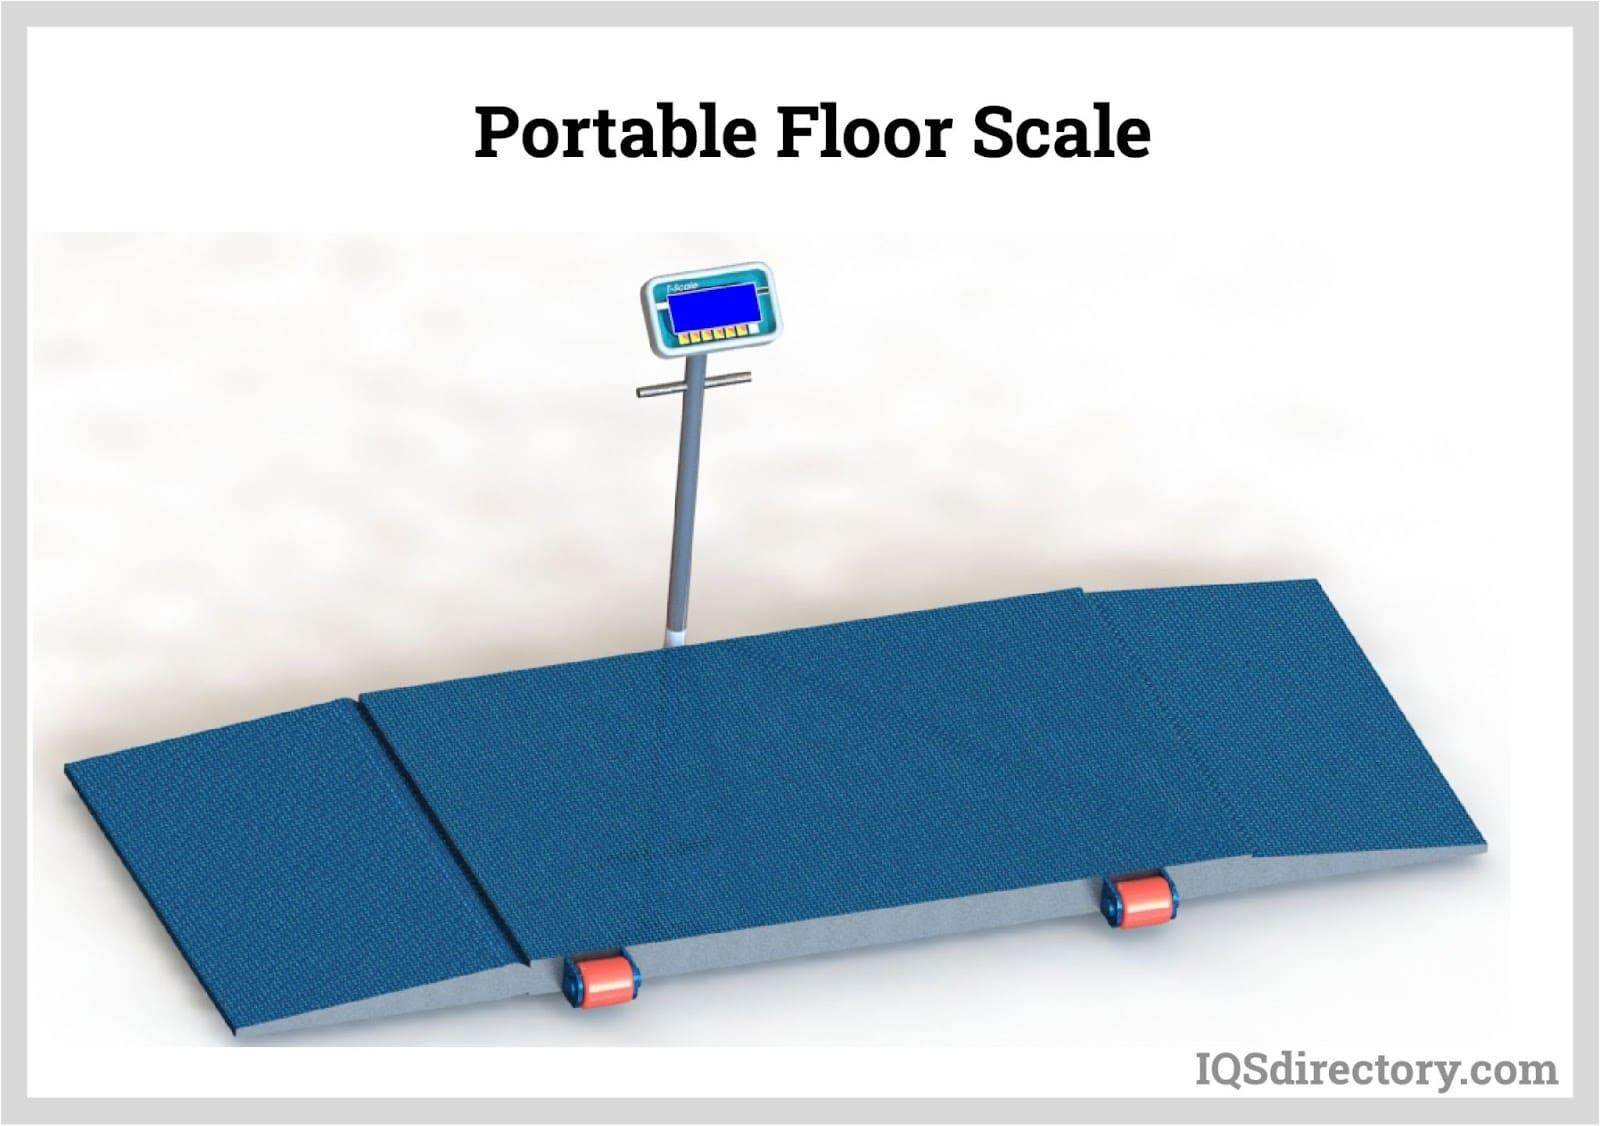 Portable Floor Scale